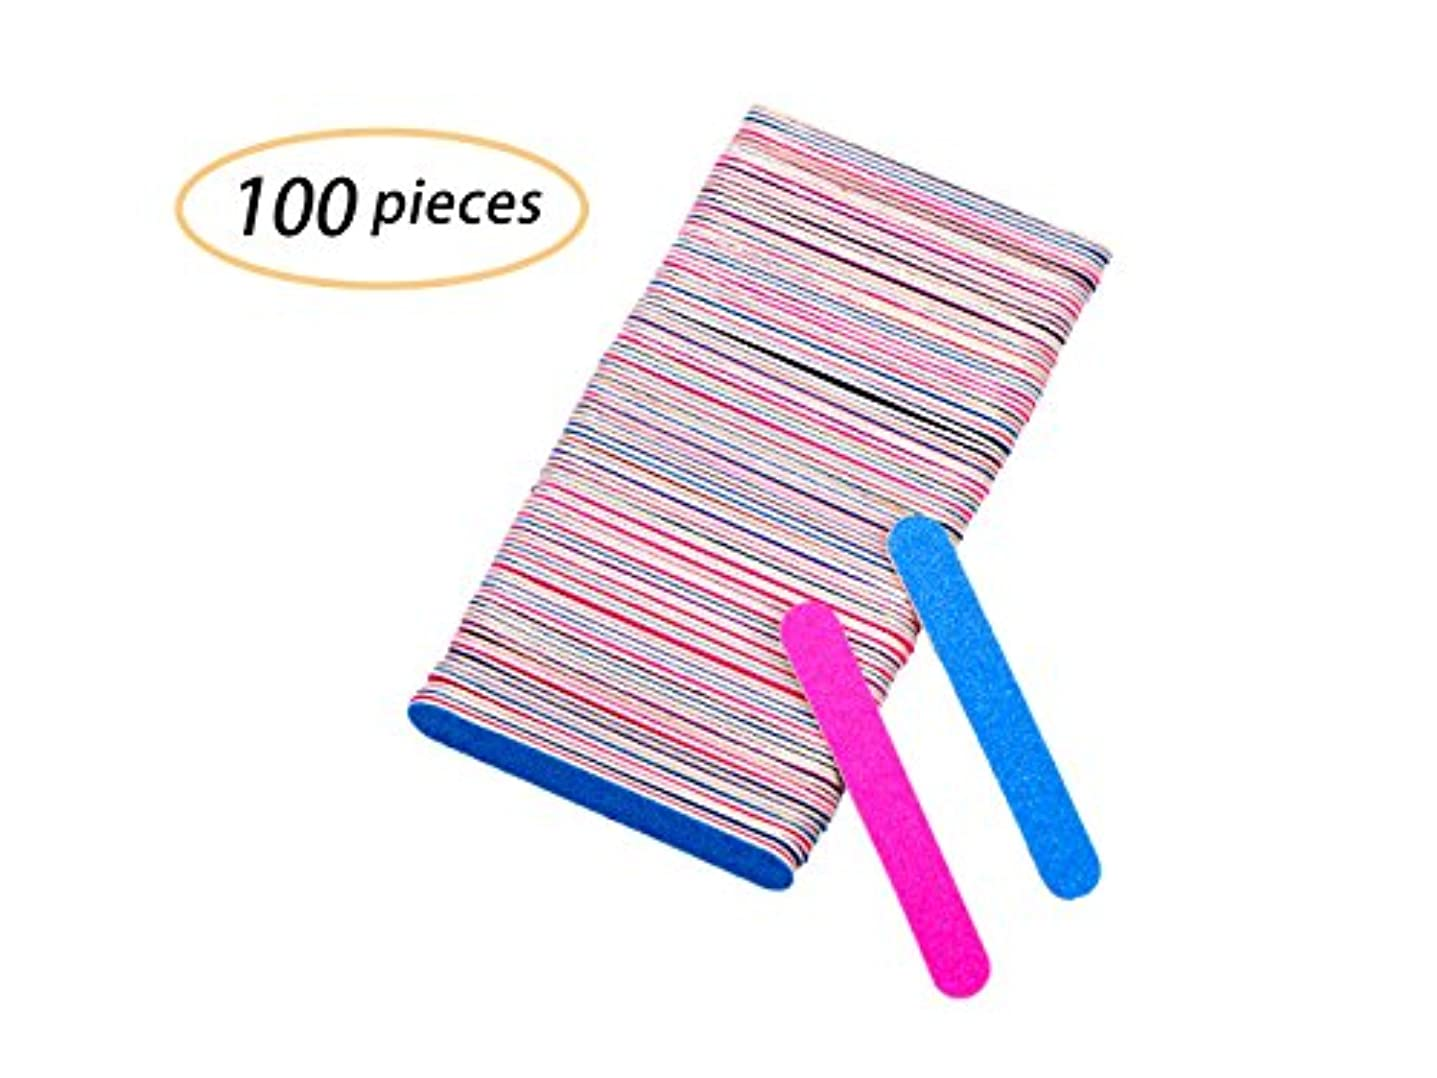 Yolito 100pcs ネイルファイル エメリーボード 爪やすり使い捨て 爪磨き両面 ジェルネイル/自爪(180、240グリット)